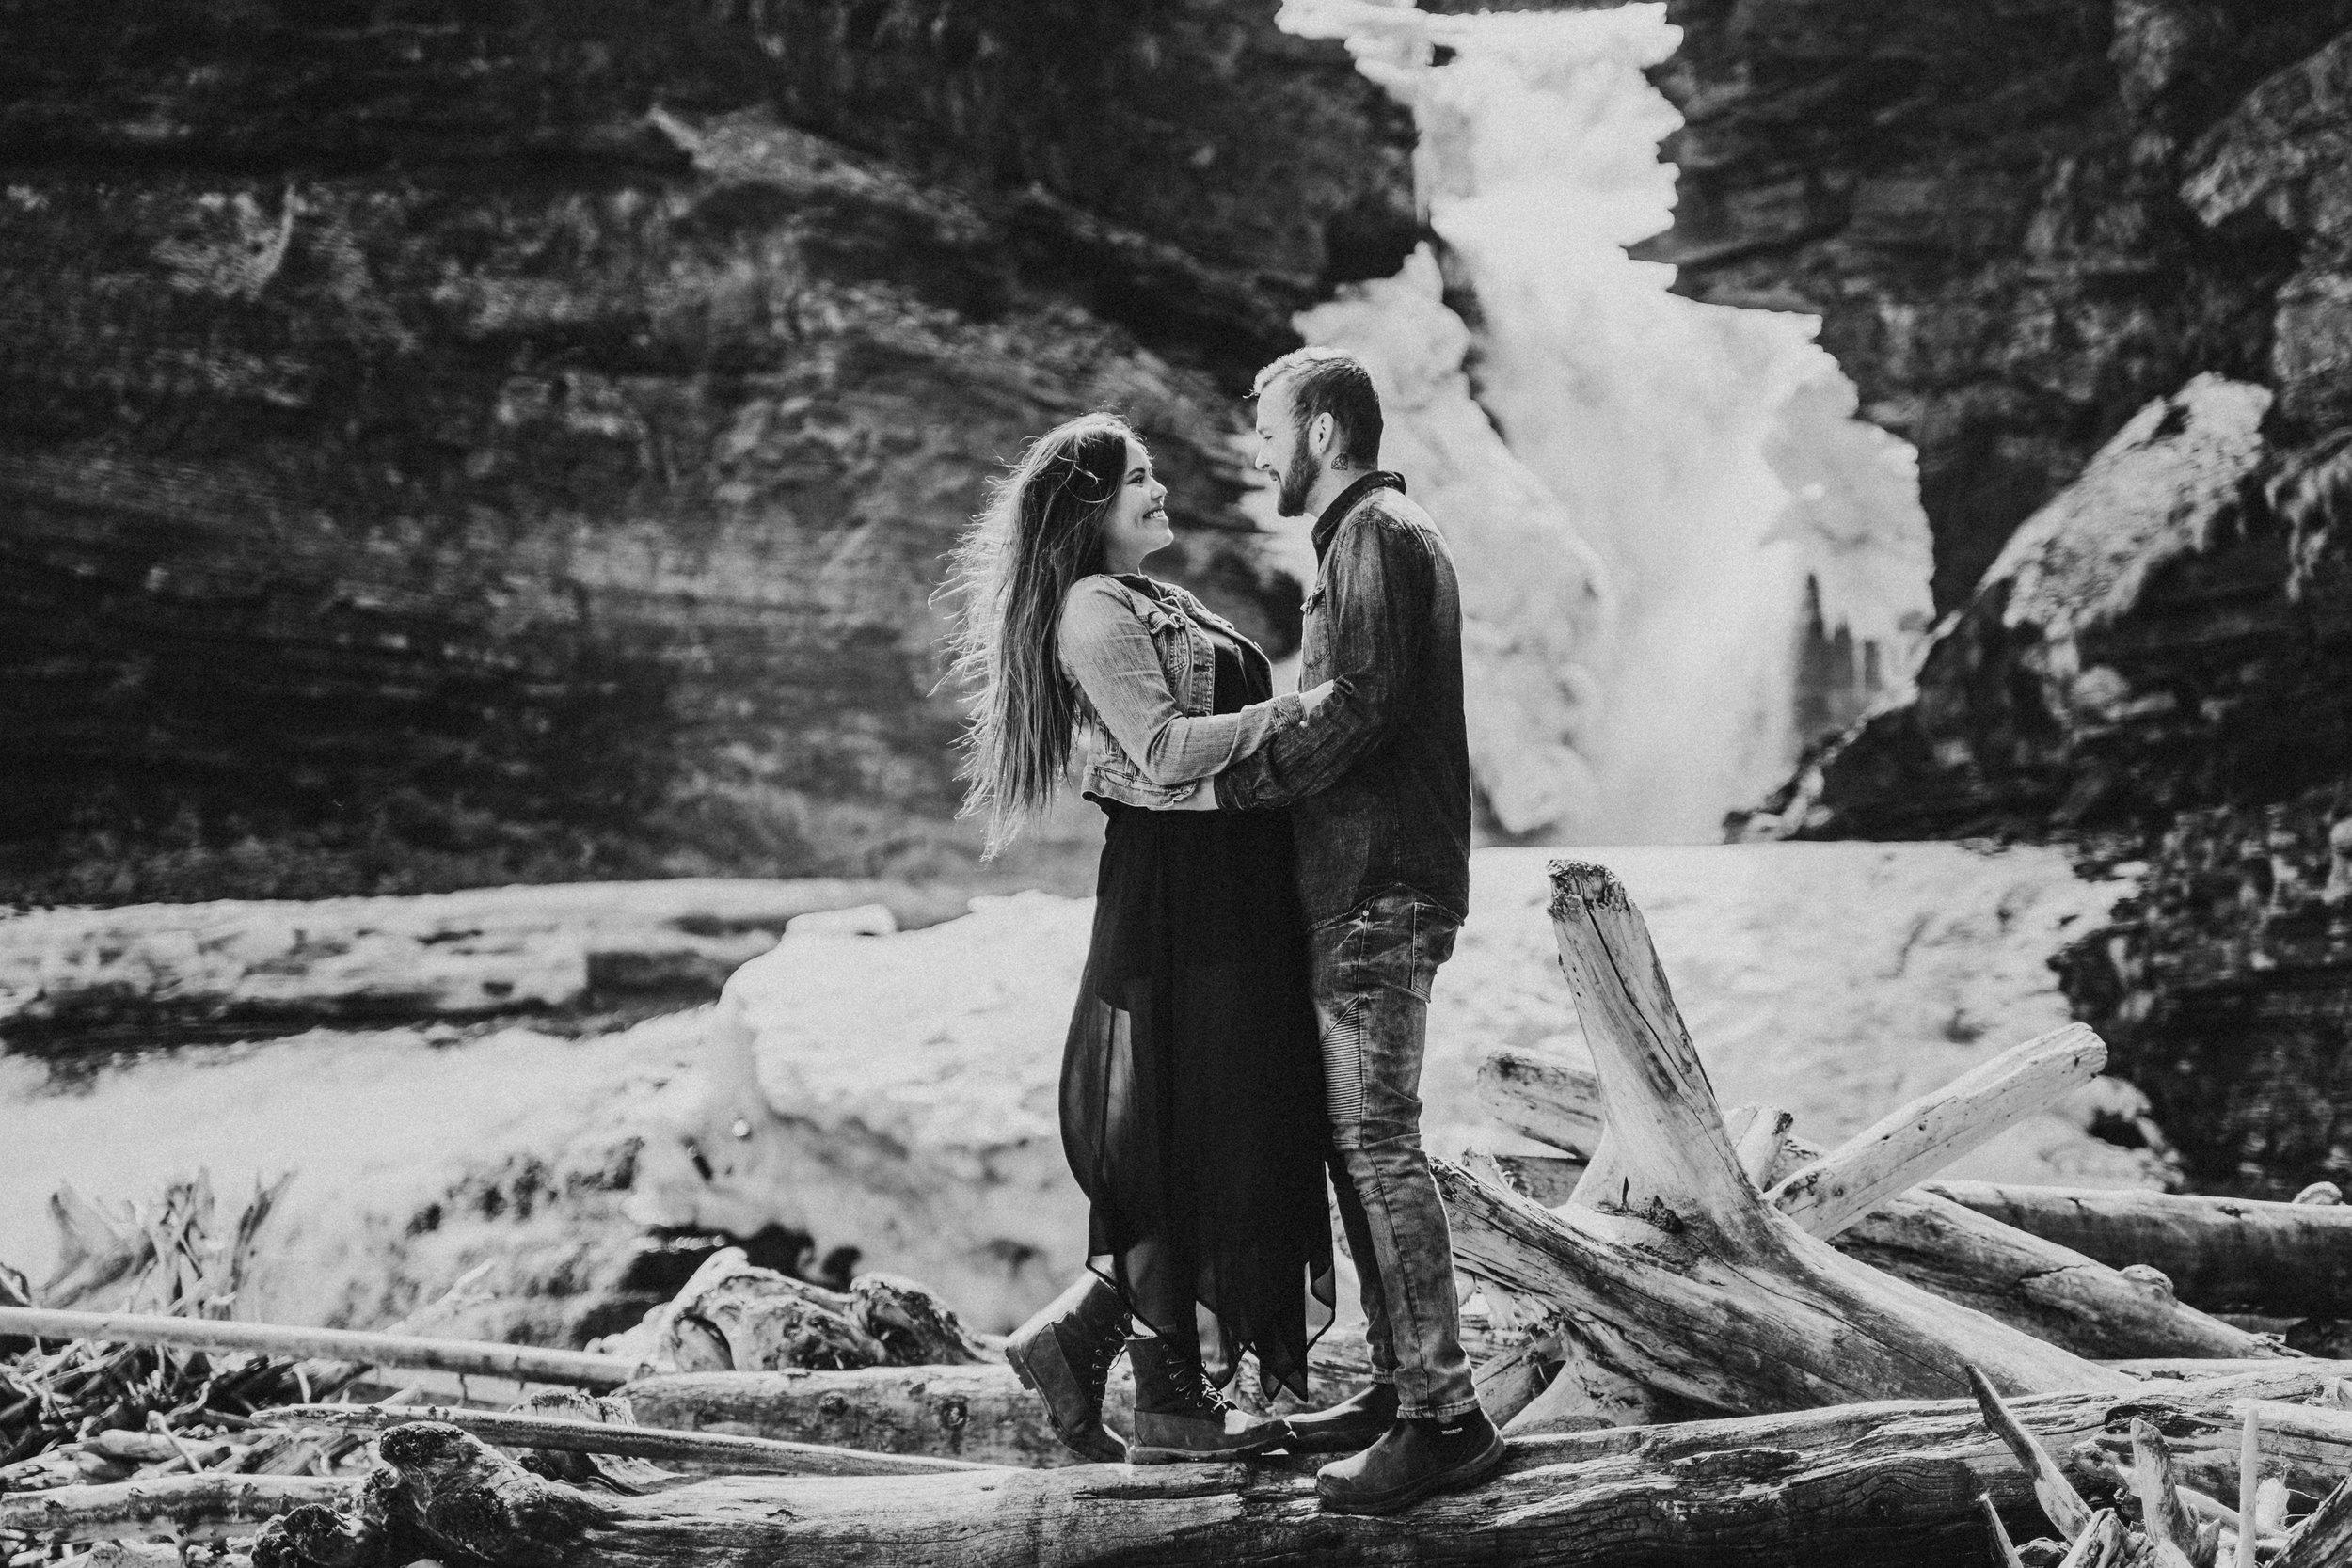 tyraephotography_photographer_wedding_elopement_engagement_photography-04391.jpg